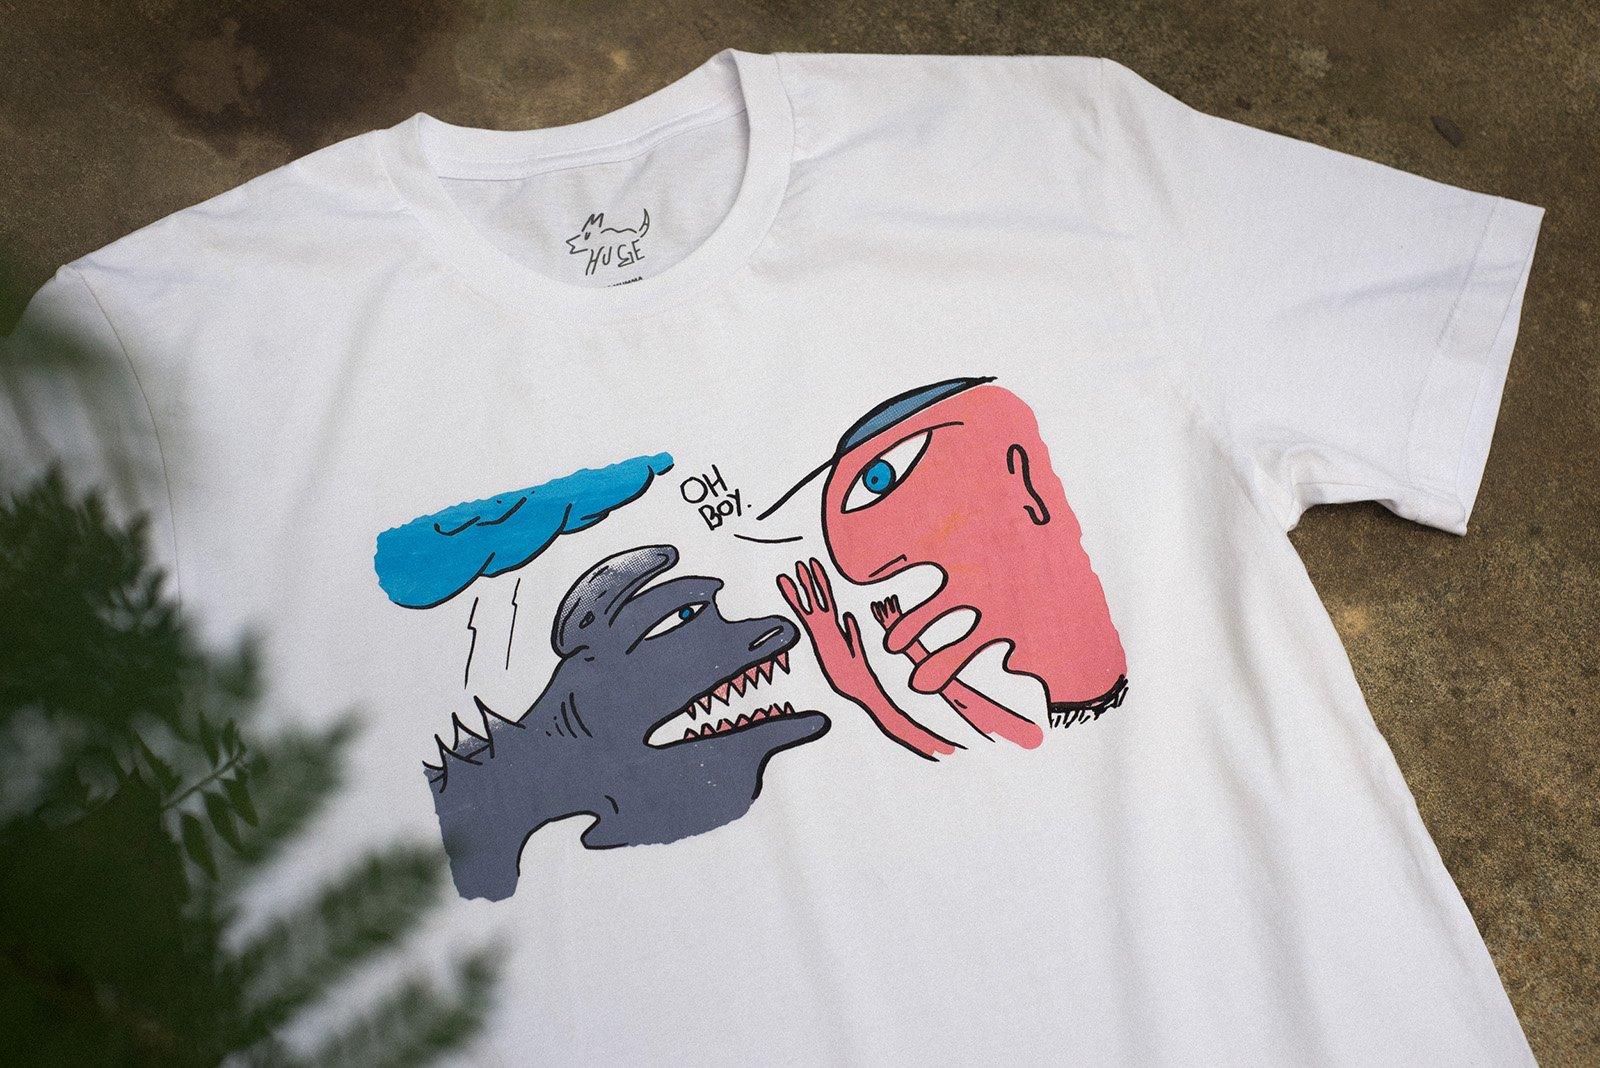 White 'Oh Boy' t-shirt